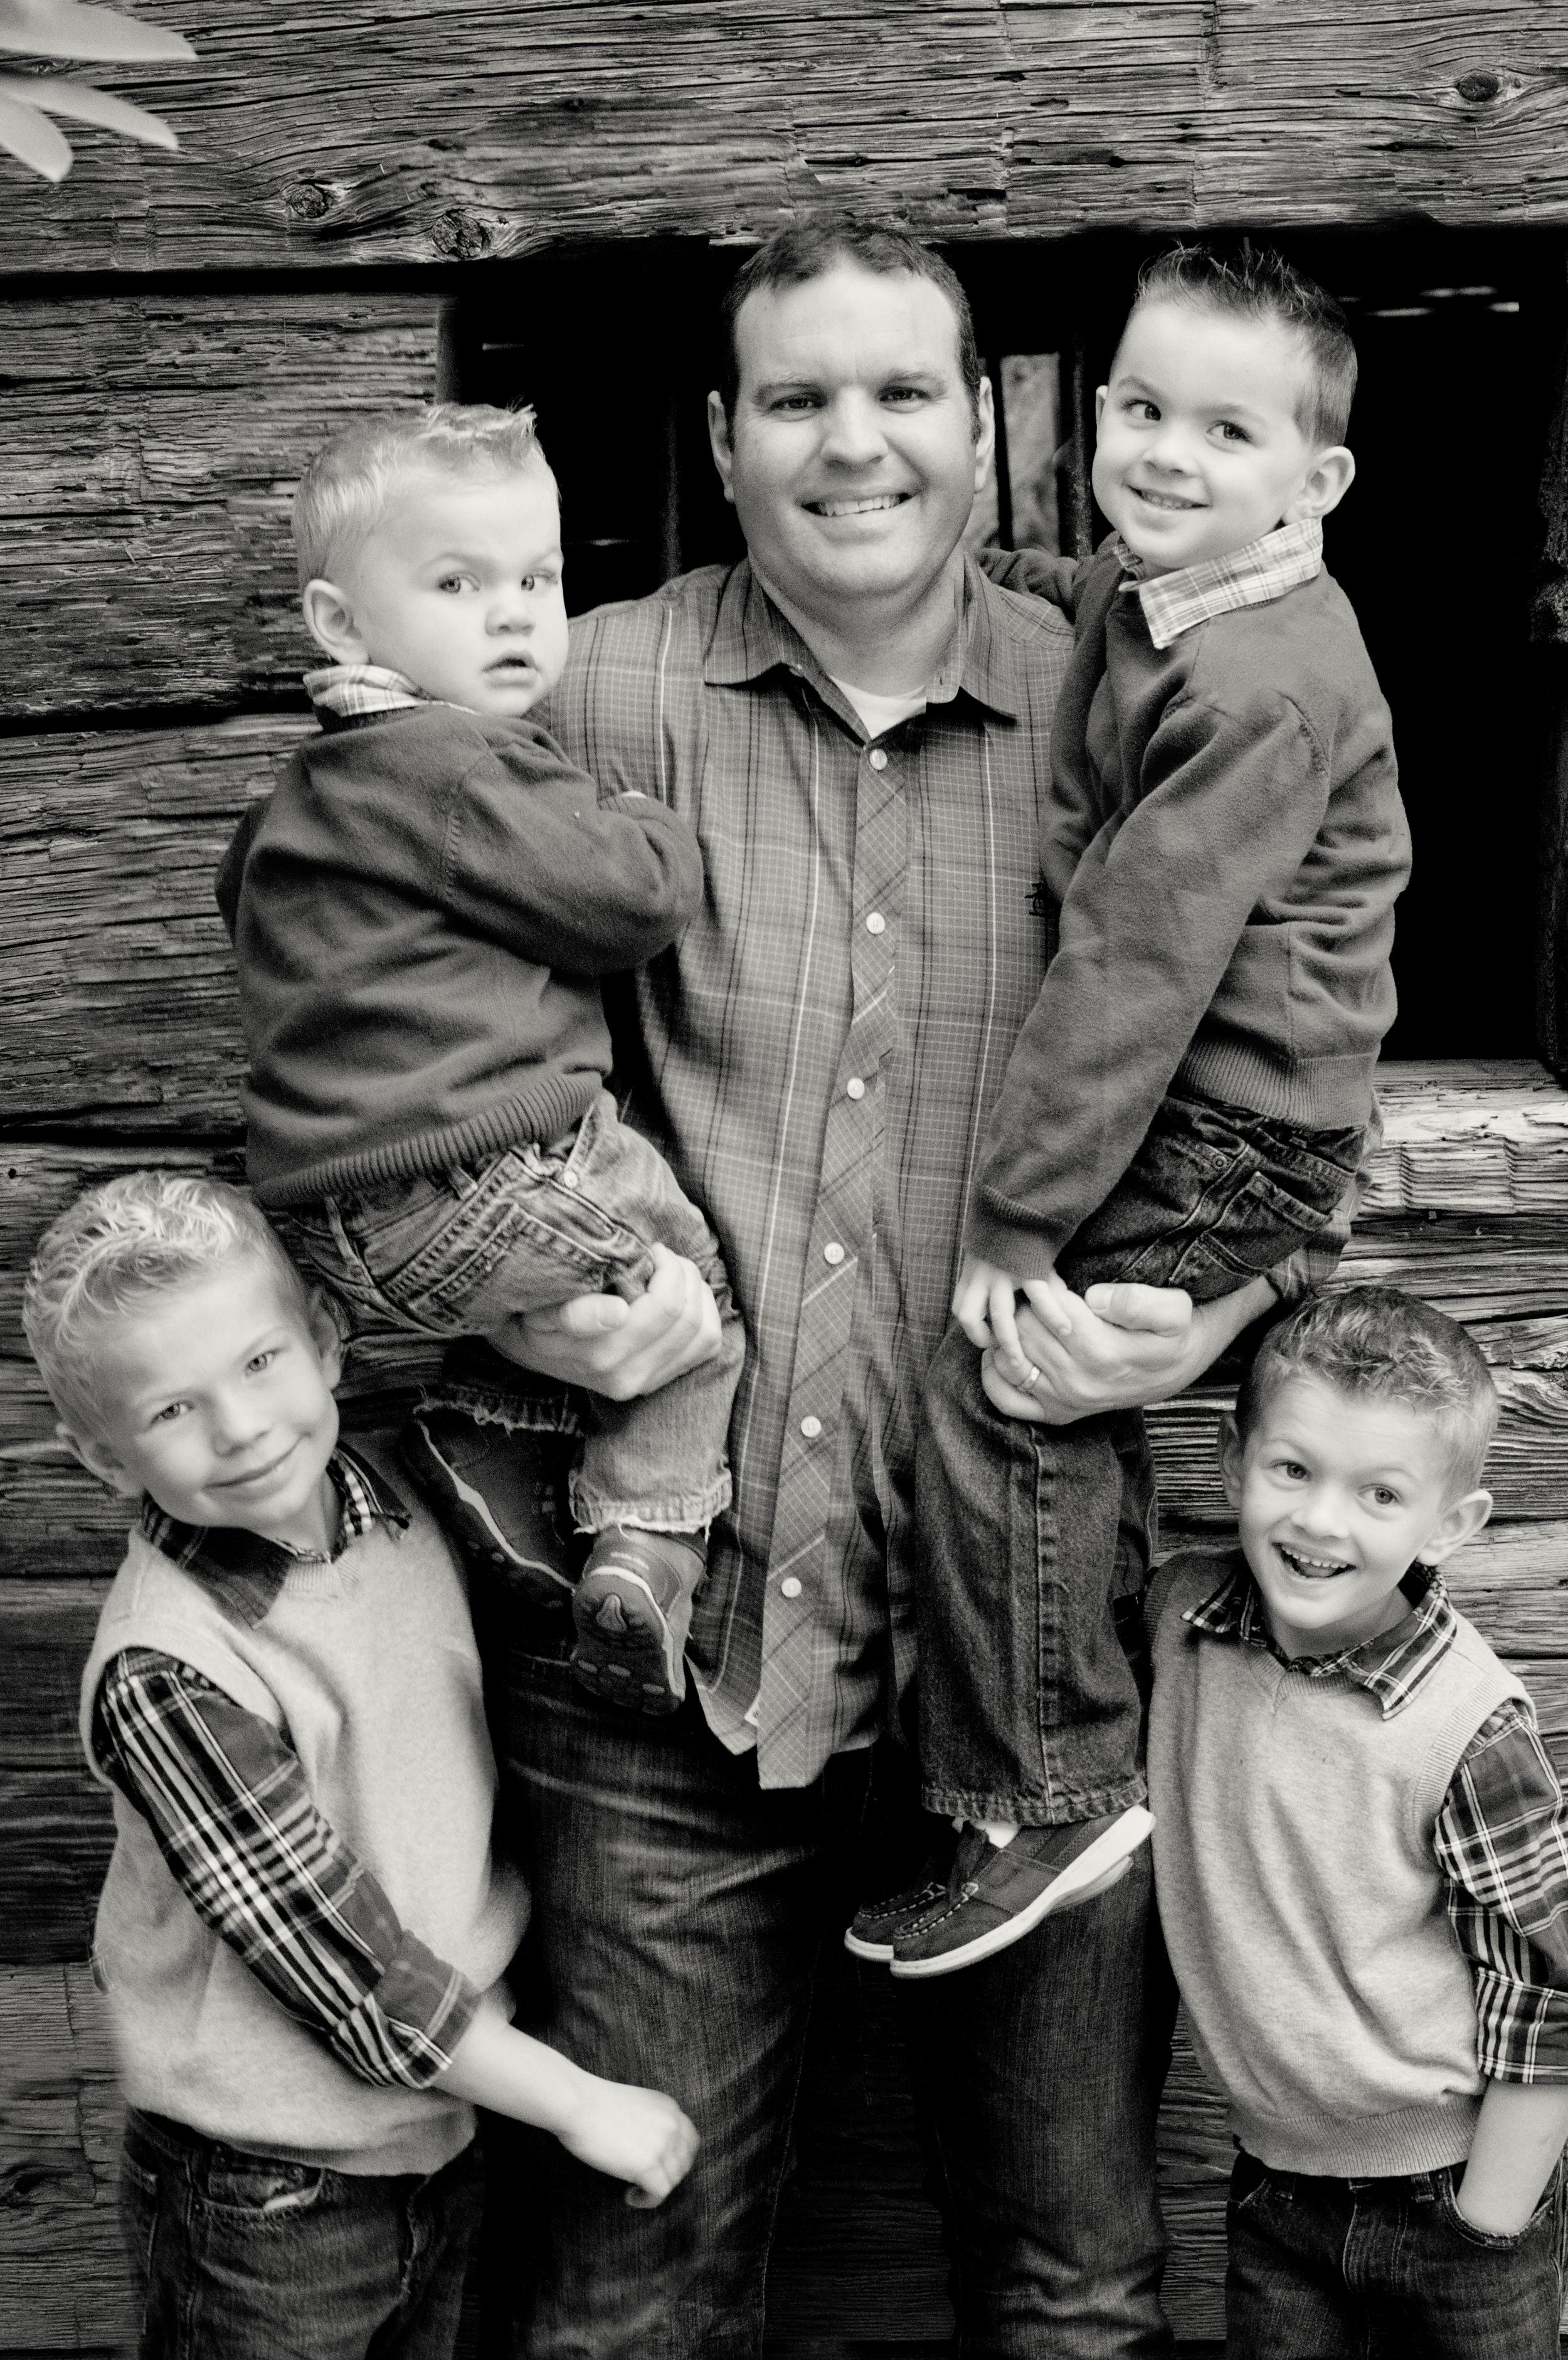 Anderson Family-Bret and boys platinum.jpg